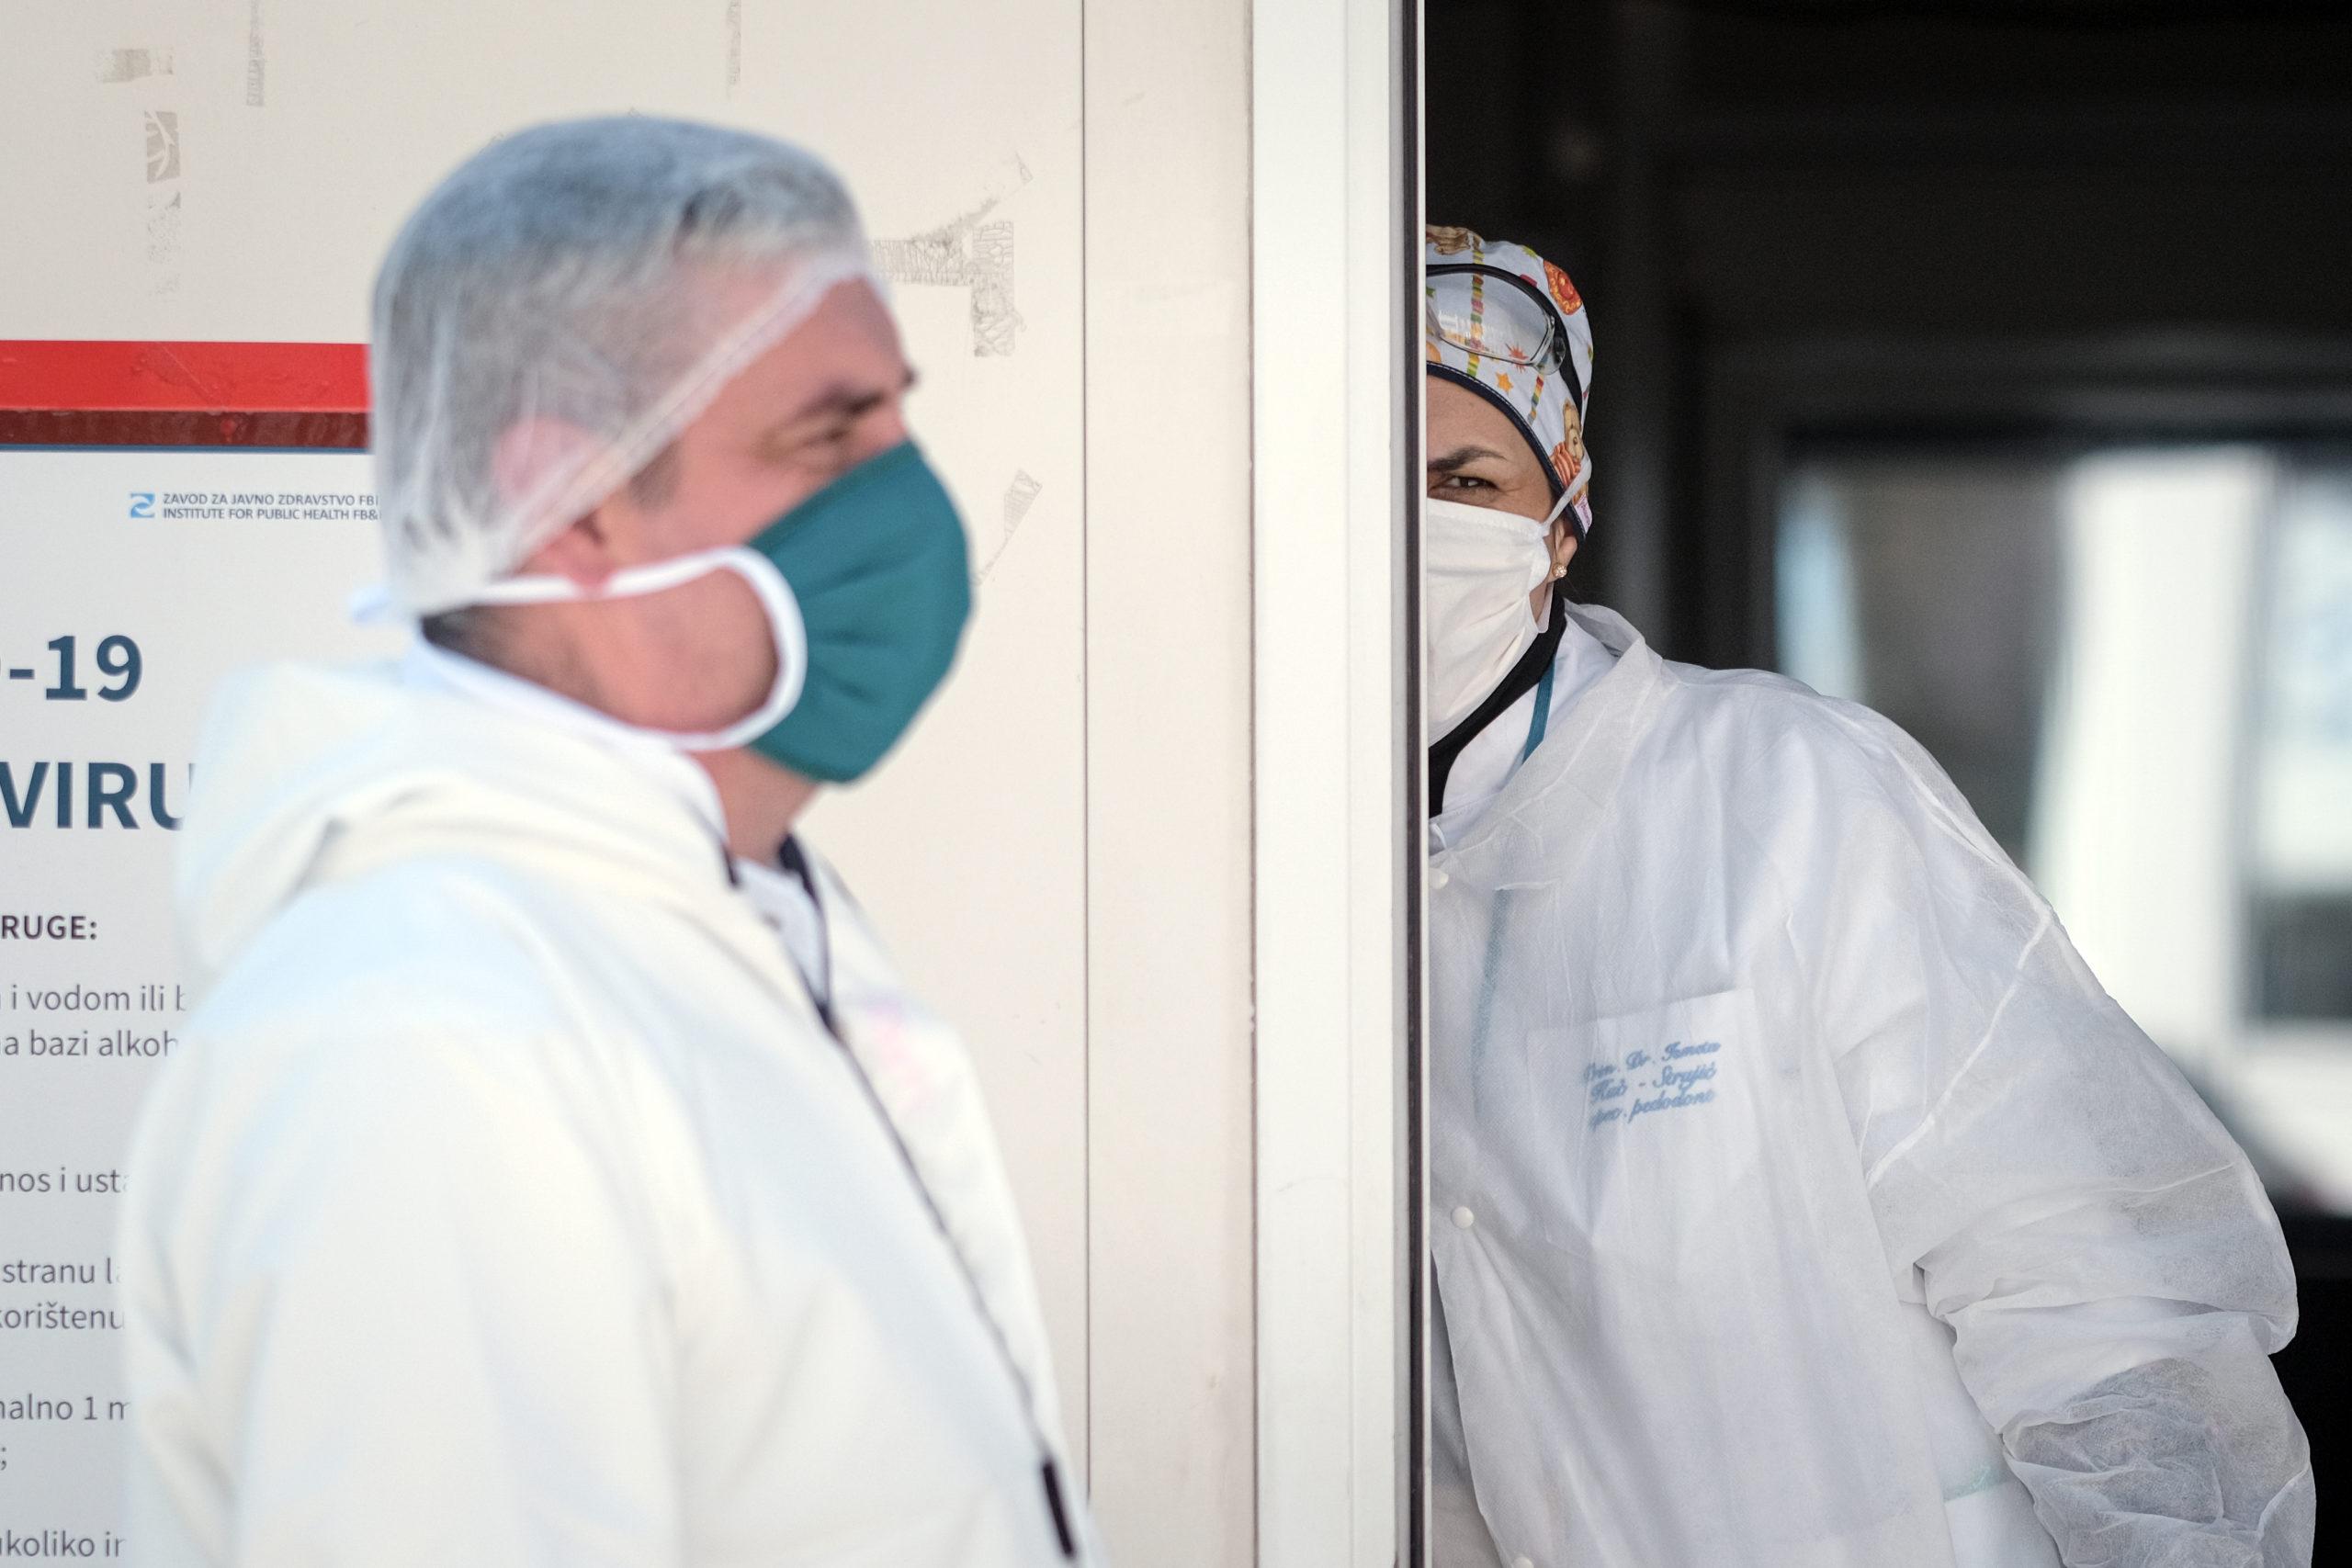 u-bosni-i-hercegovini-123-pozitivnih-na-korona-virus,-preminule-dve-osobe